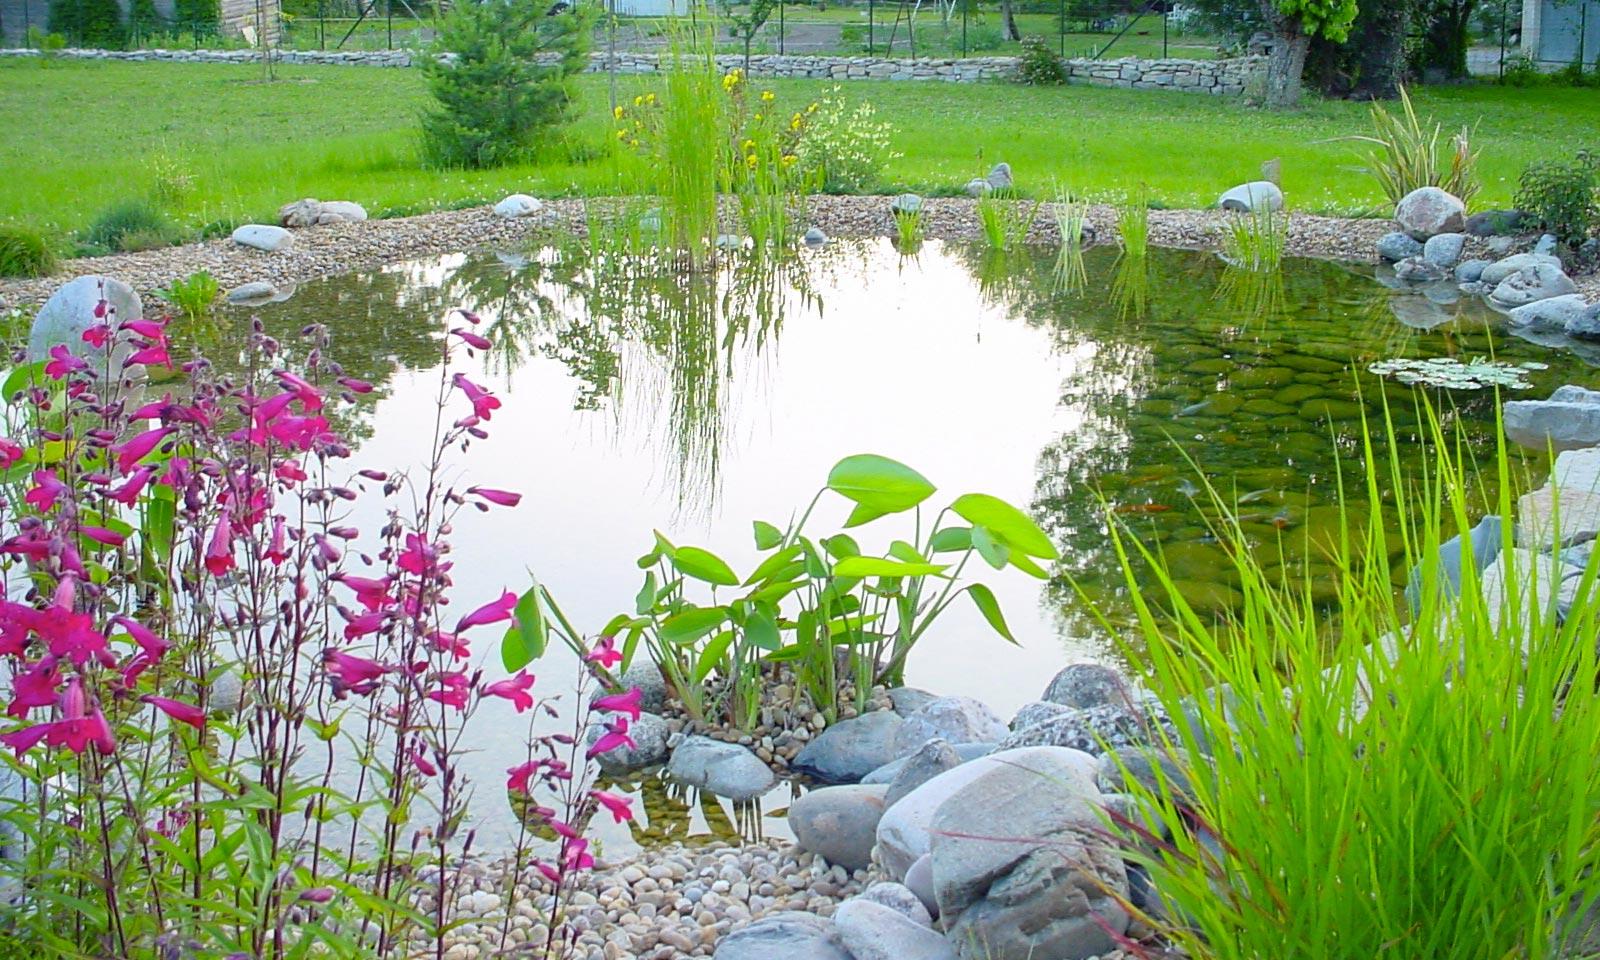 Emejing Bassin De Jardin Villaverde Photos - House Design ...